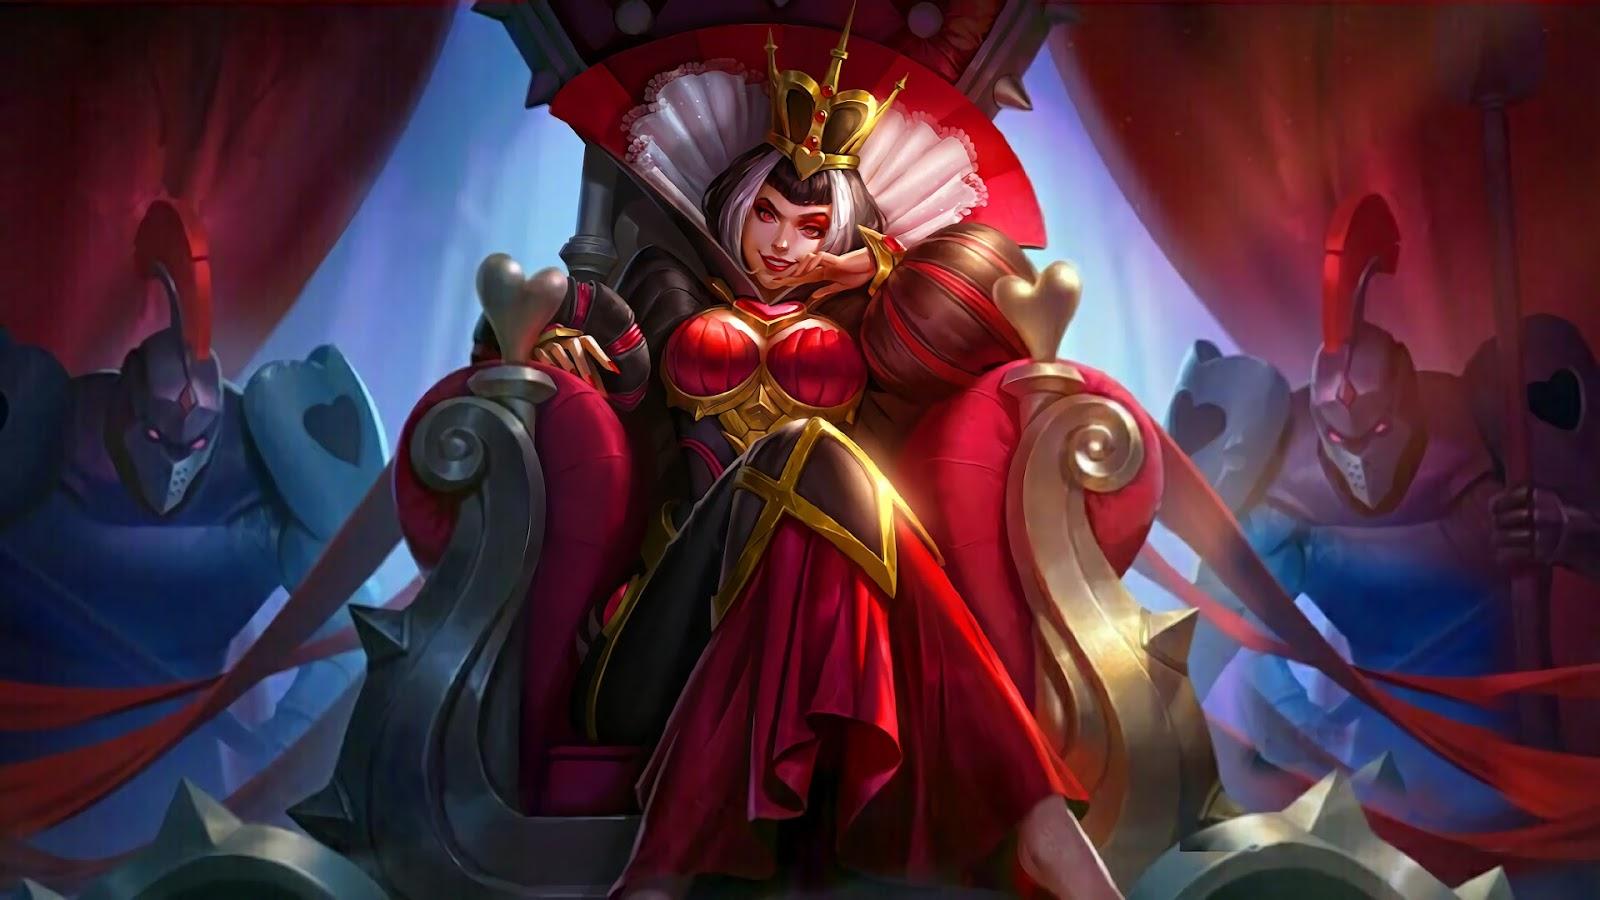 Wallpaper Aurora Heartbreak Empress Skin Mobile Legends HD for PC